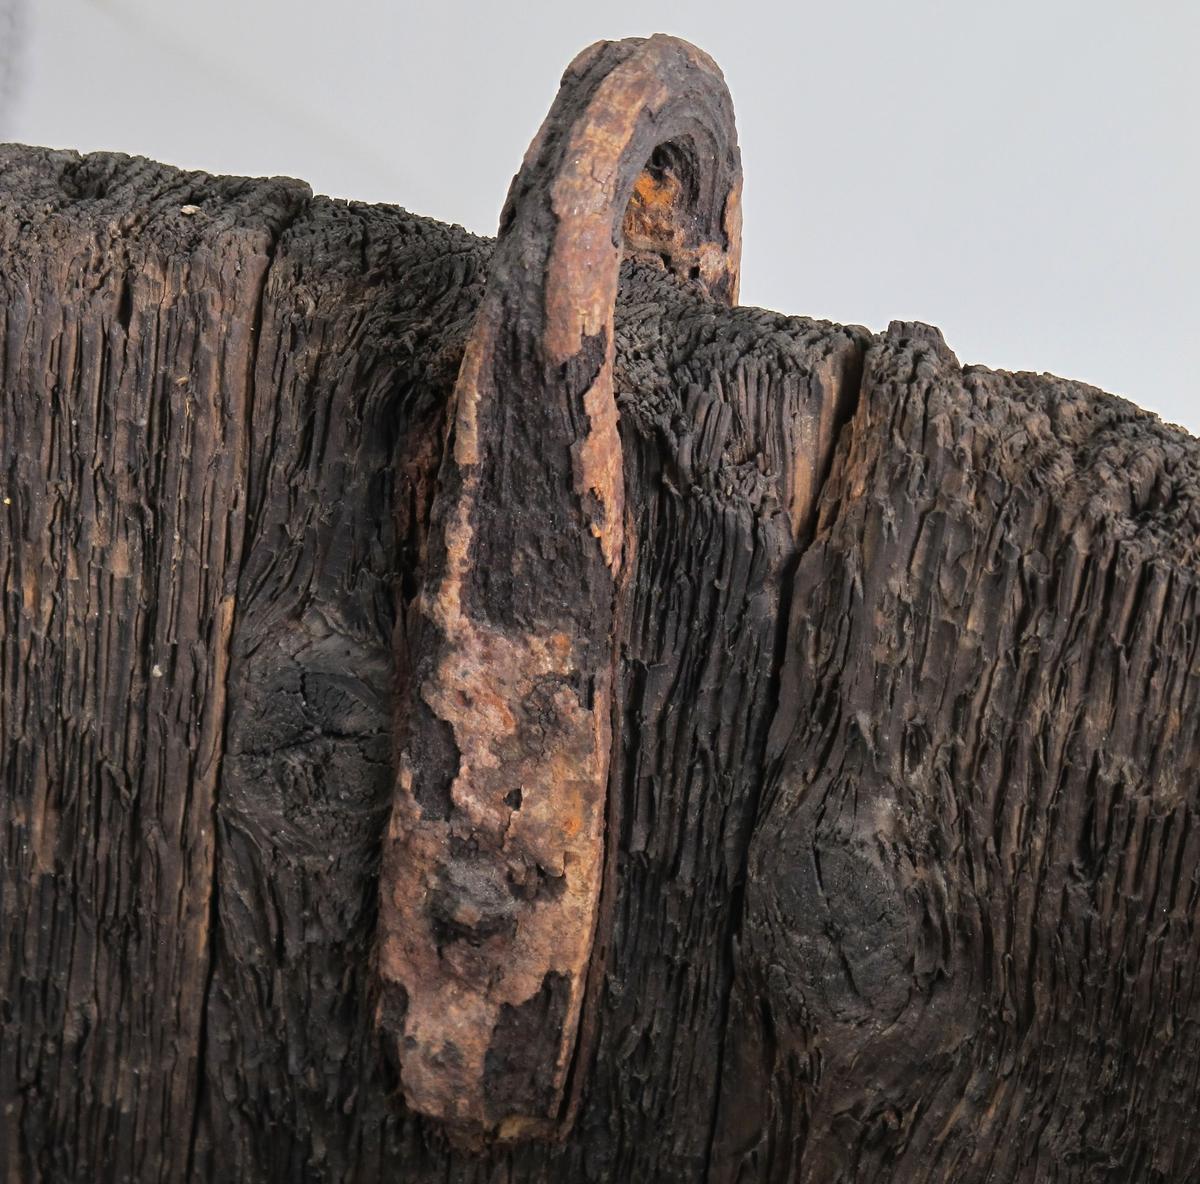 Malmtønner, 2 stk. Bøkkerarbeid.  Tre, trolig furu, gjorder av jern. To svære tønner med utoverskrånende sider,  3 gjorder. 2 runde små hanker i øvre kant.    a) alt jern rødt og sprødt, dels rustet bort.    b) rustent, men ikke så ille som a).